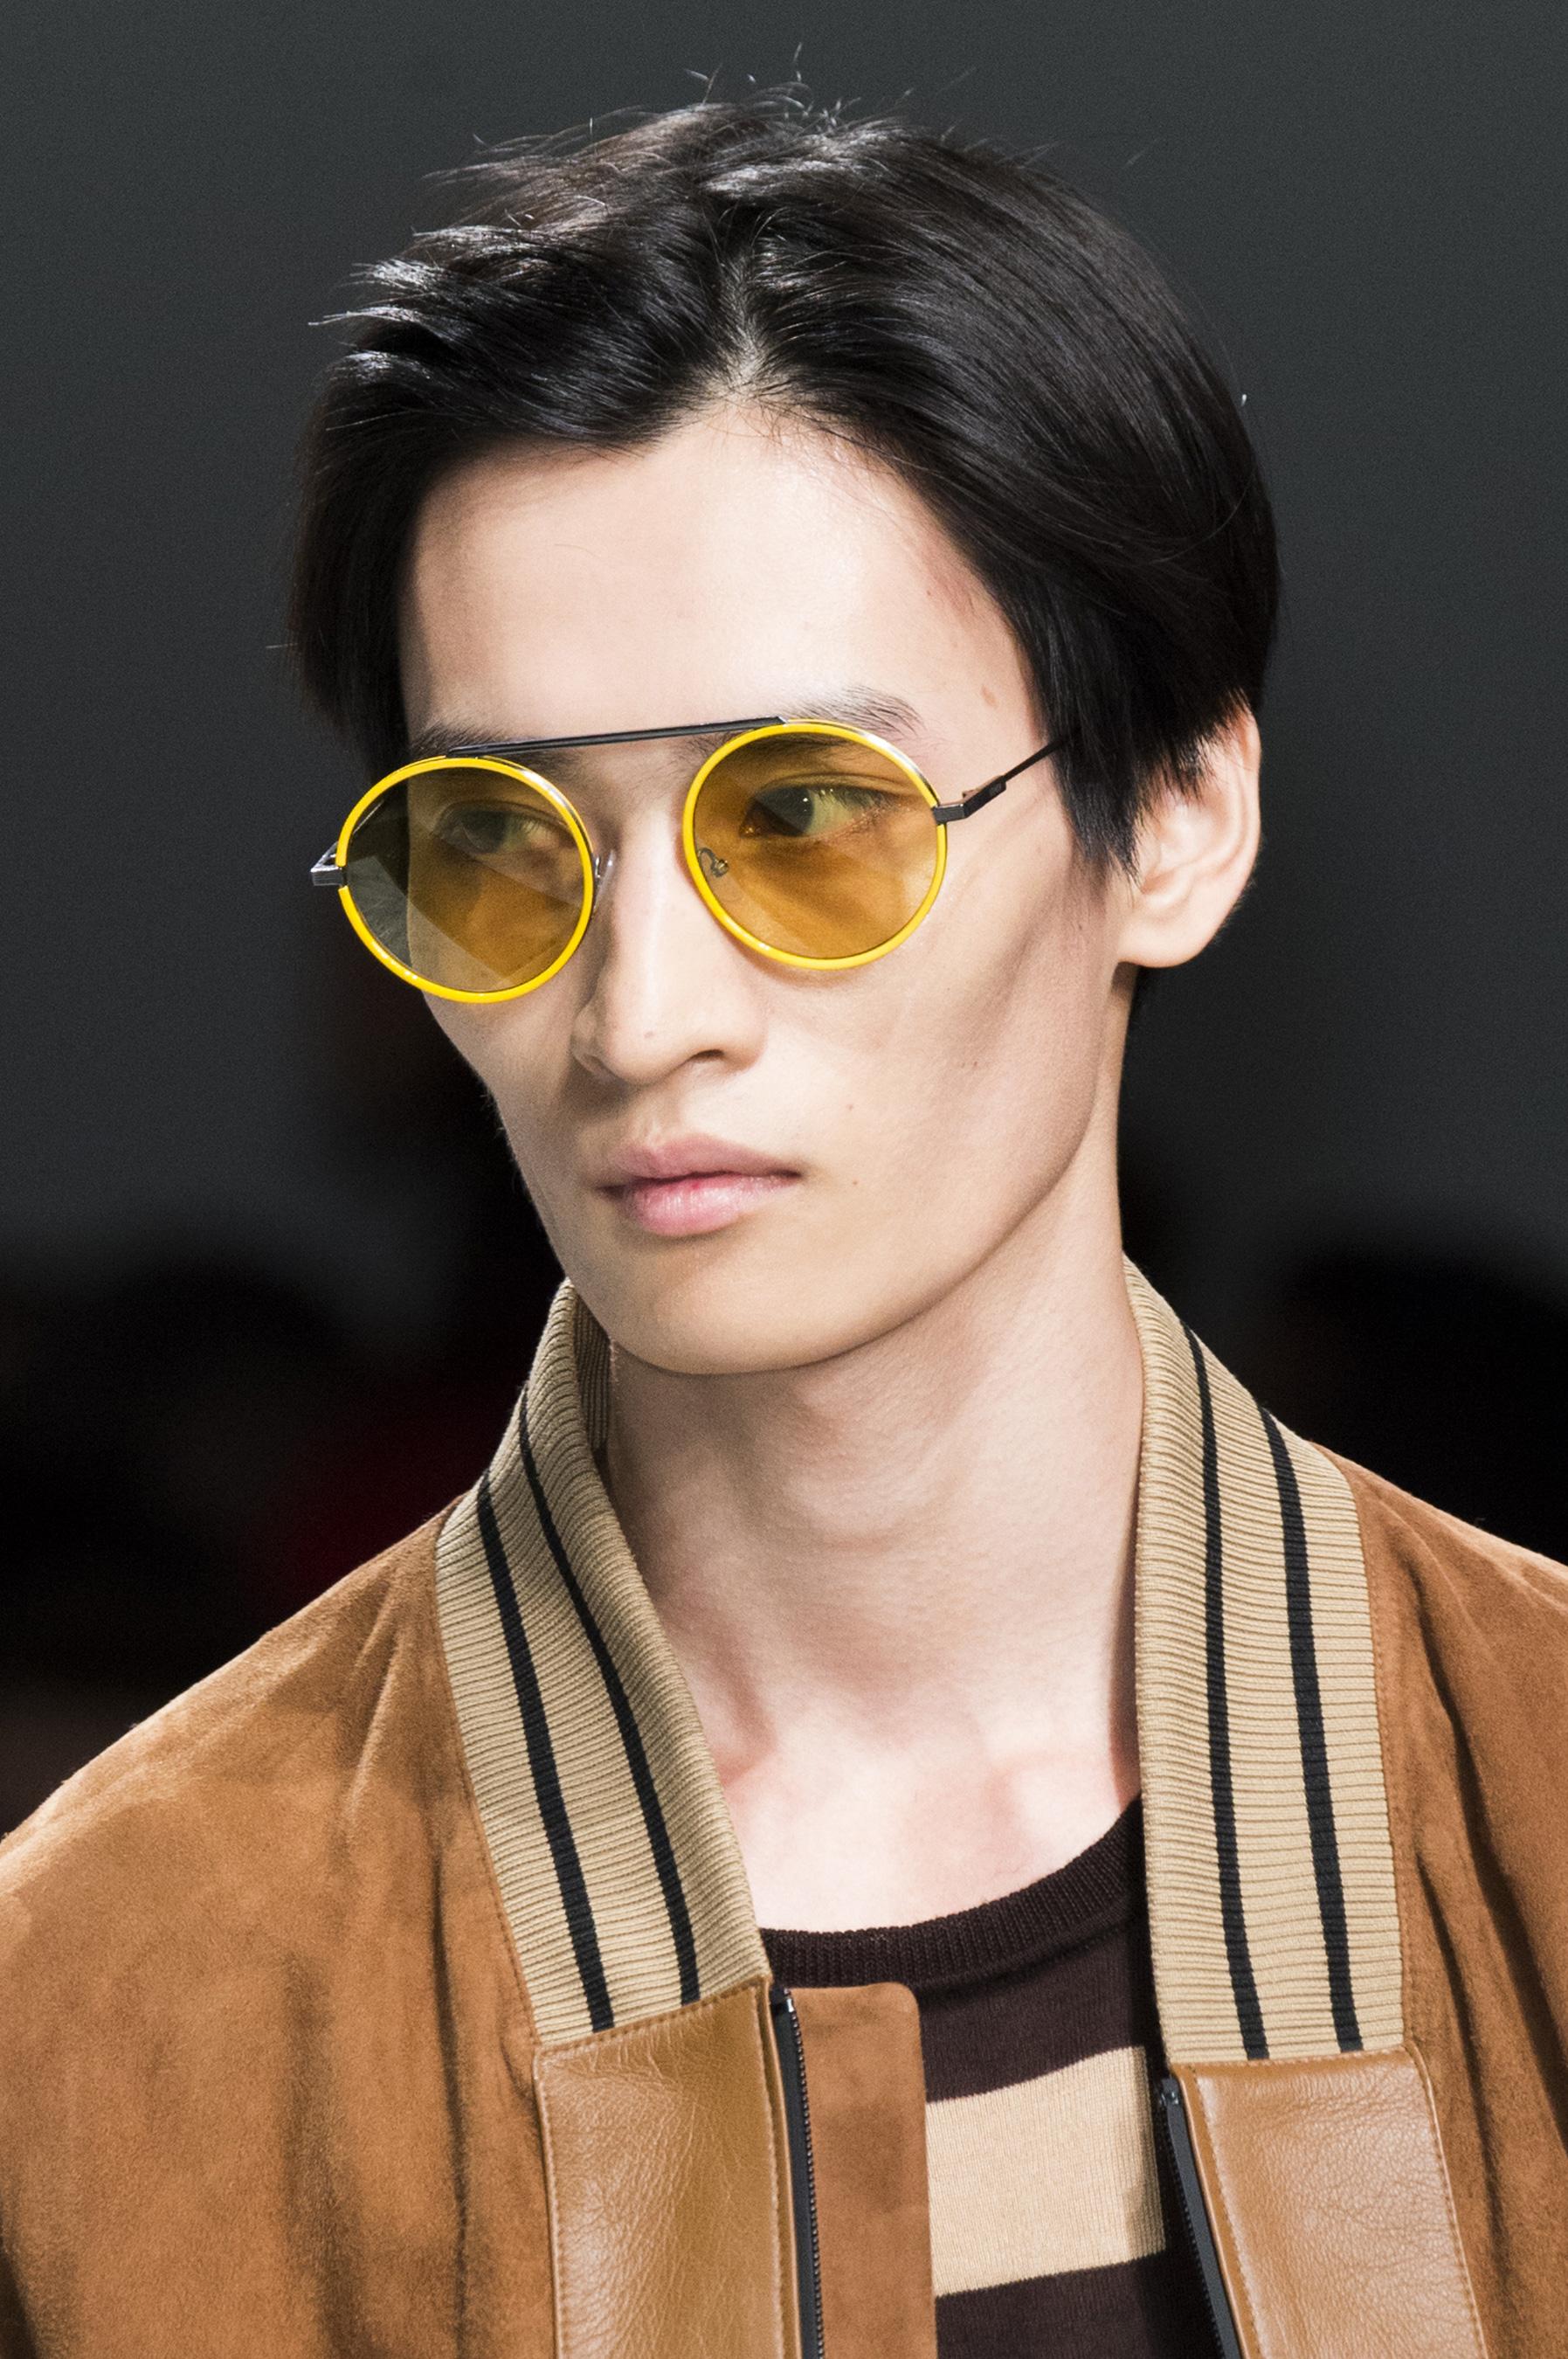 Мужская стрижка 2018 азиатского типа